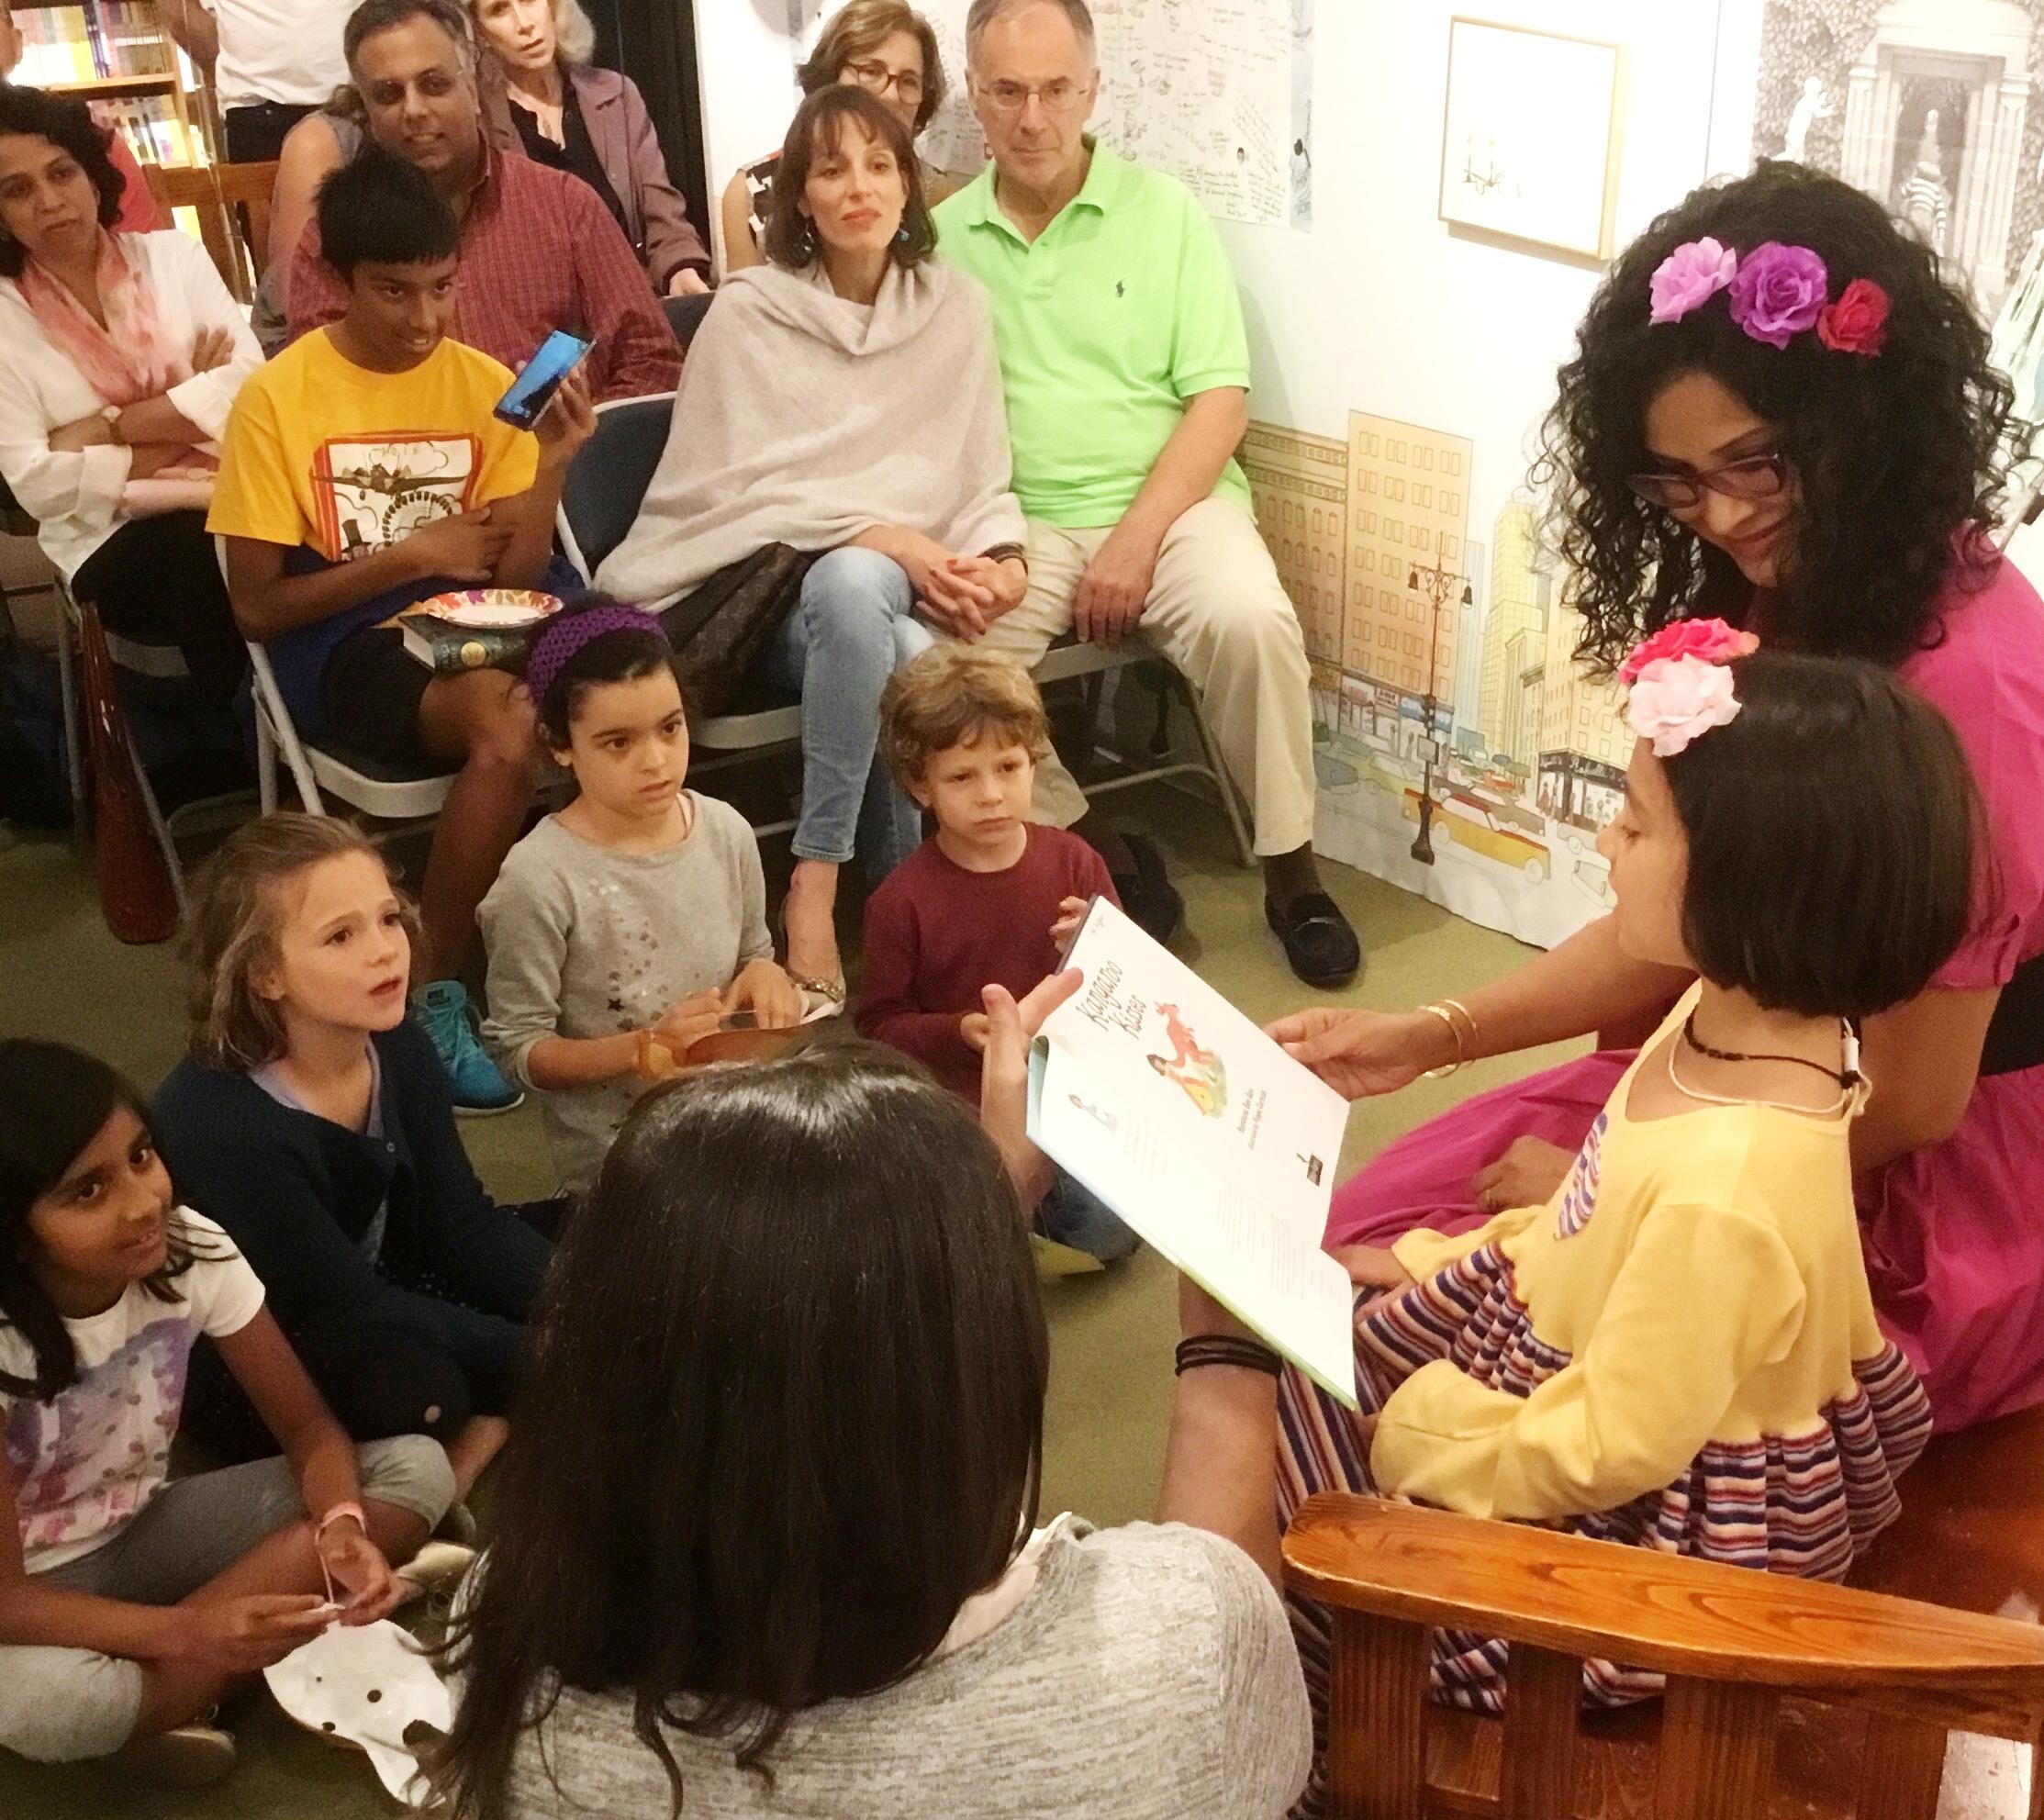 A Rapt Audience: Sulakshana reads Kangaroo Kisses with Nandana in Book of Wonder, September 25, 2016